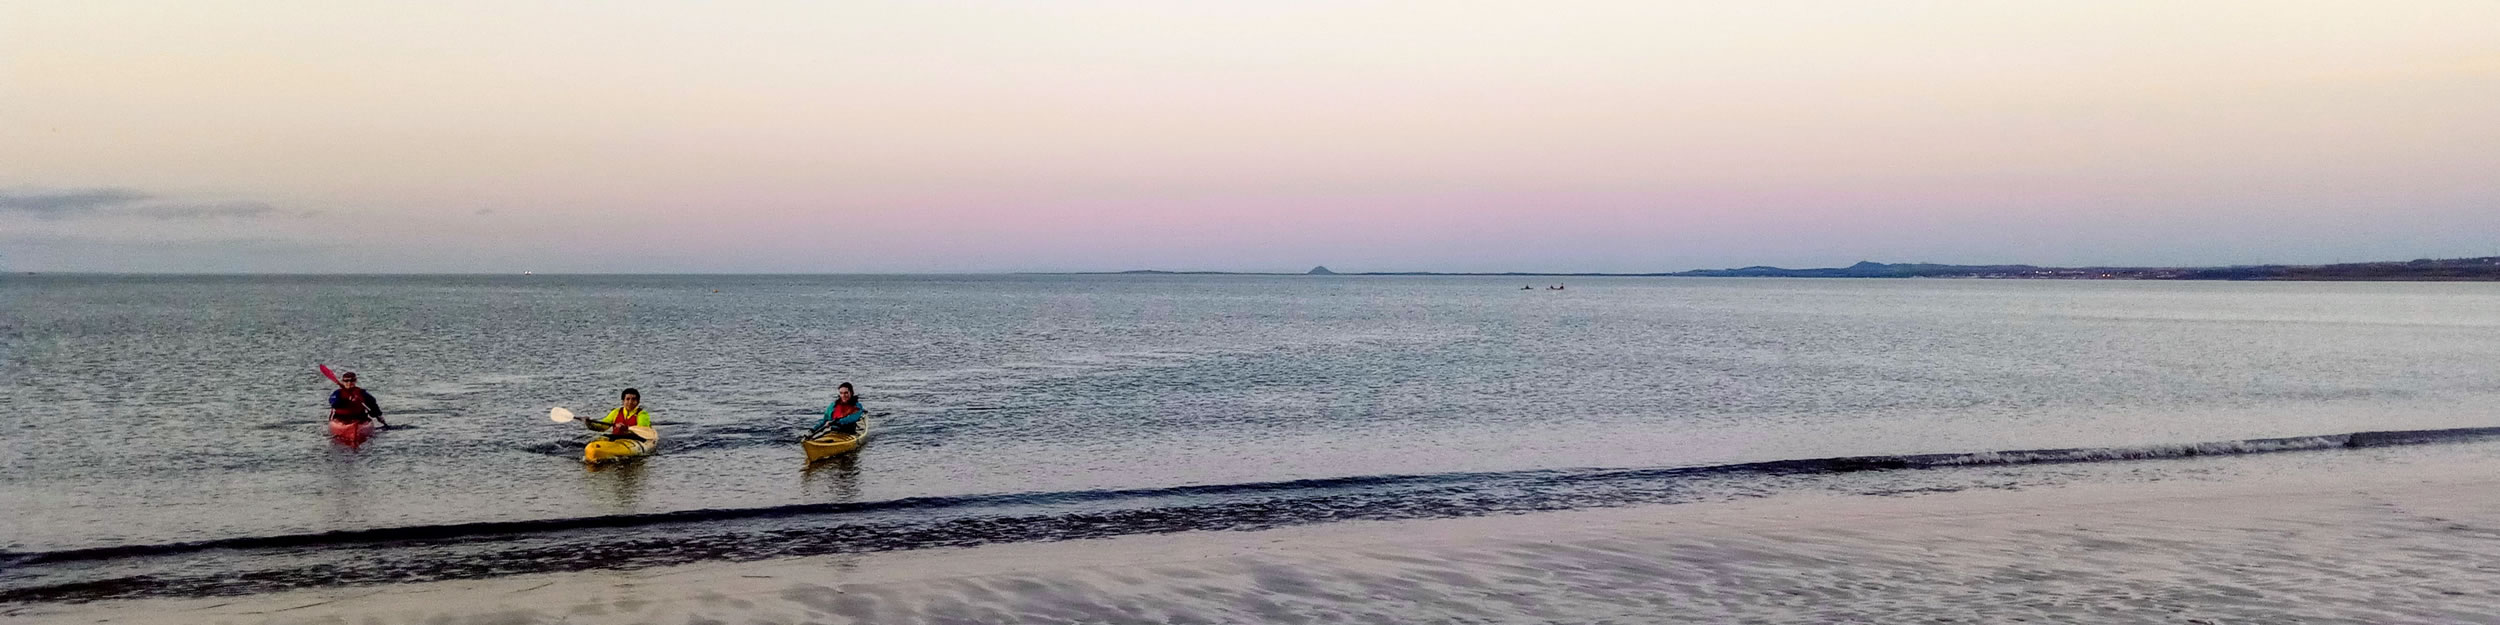 Portobello Sailing, Kayaking and Rowing Club